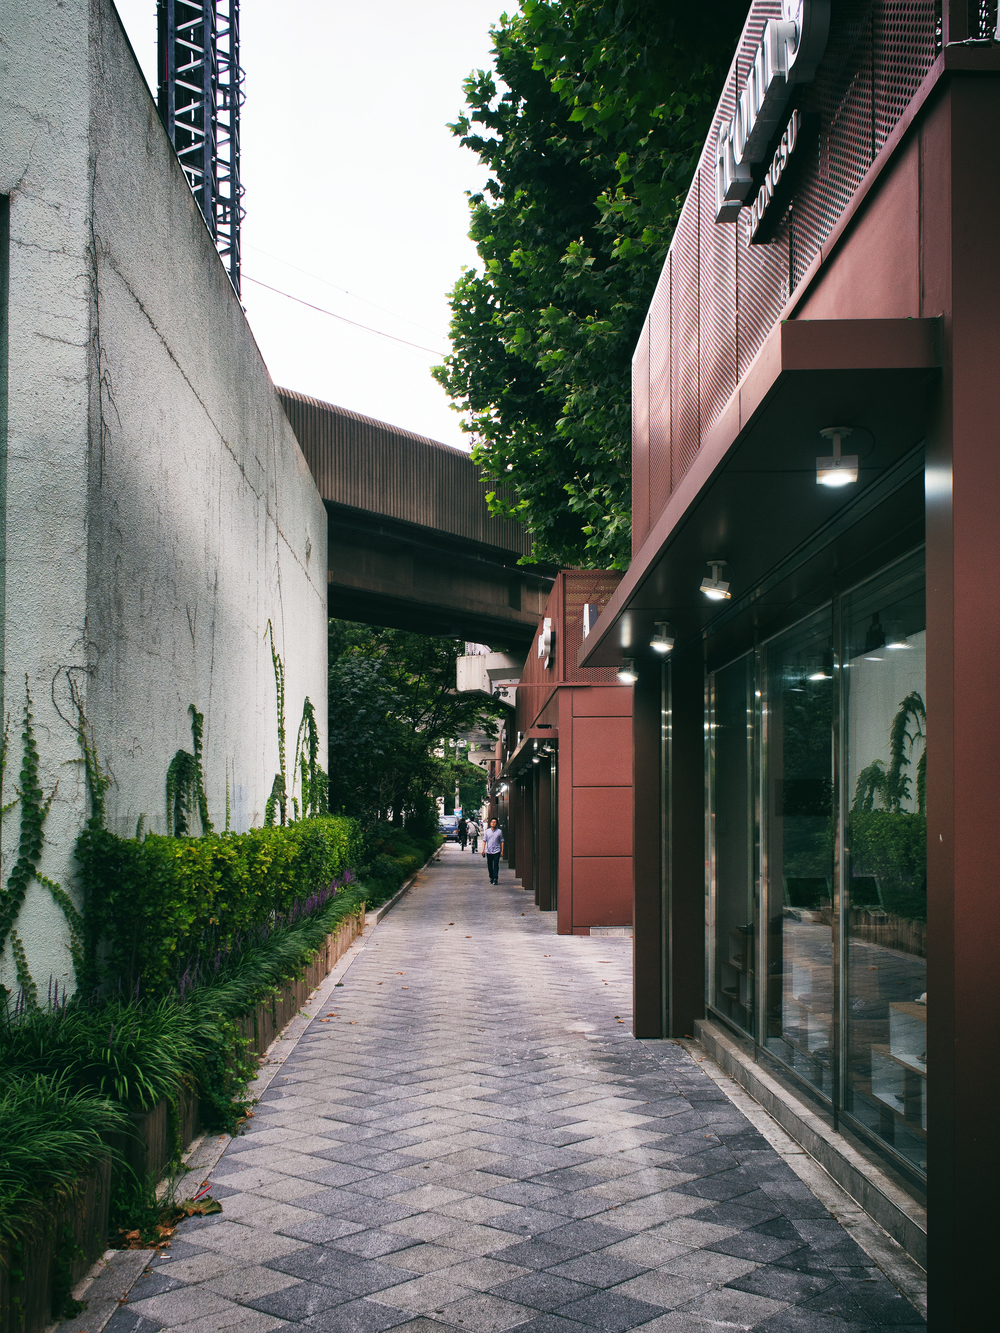 The shoe street.